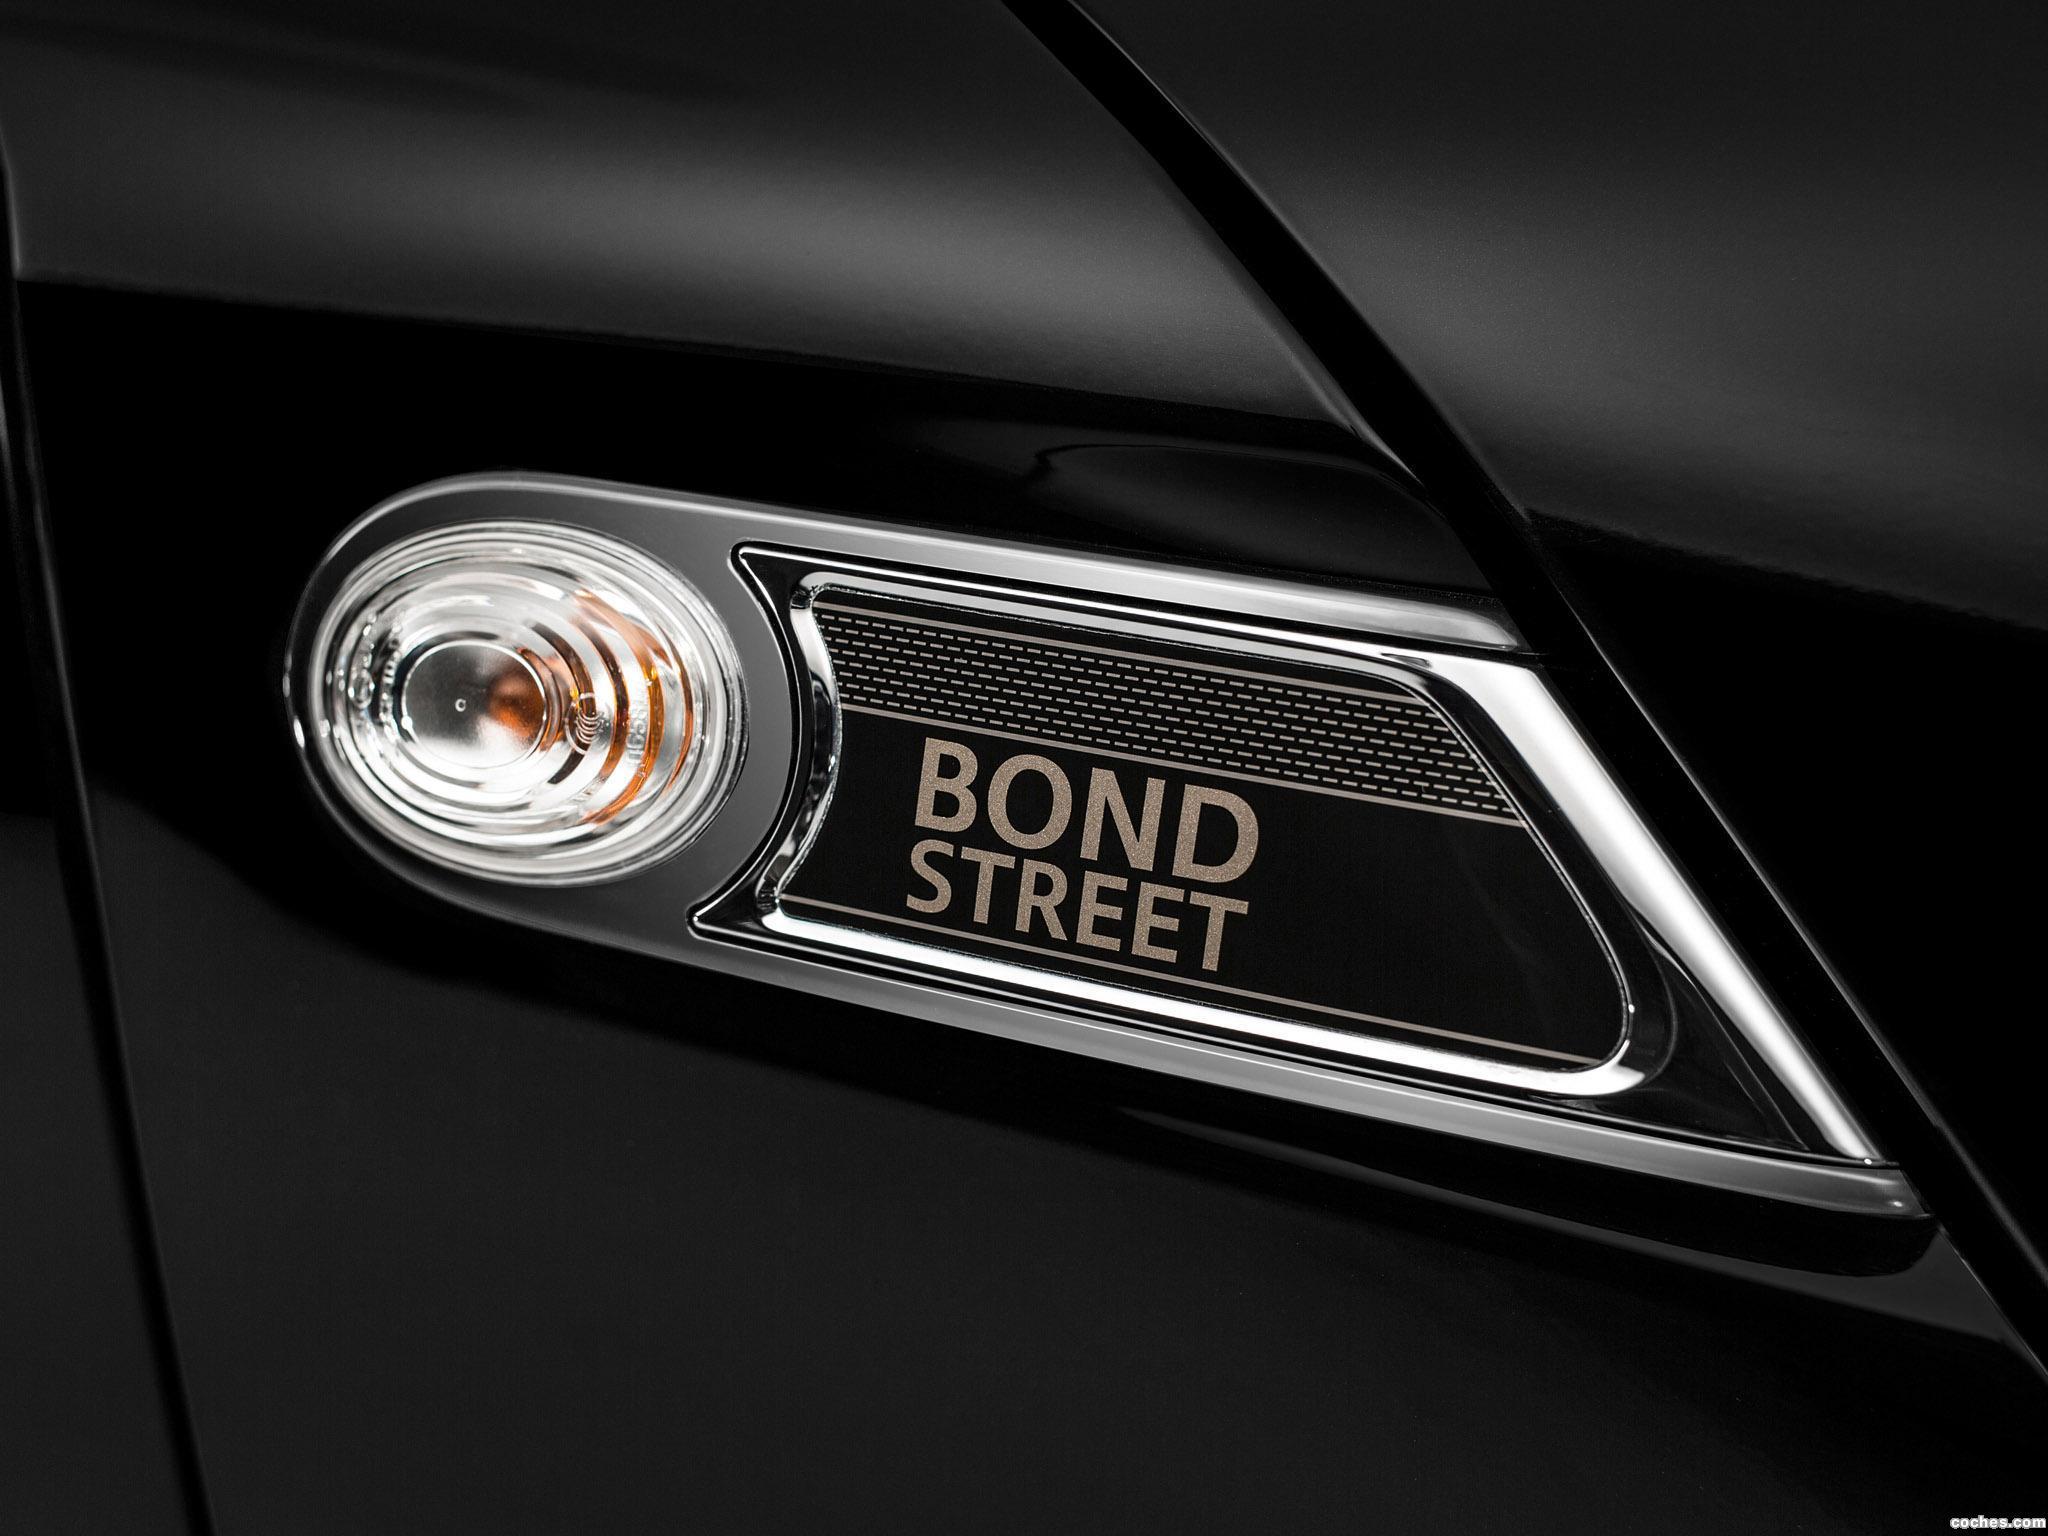 Foto 6 de Mini Clubman Cooper S Bond Street 2013